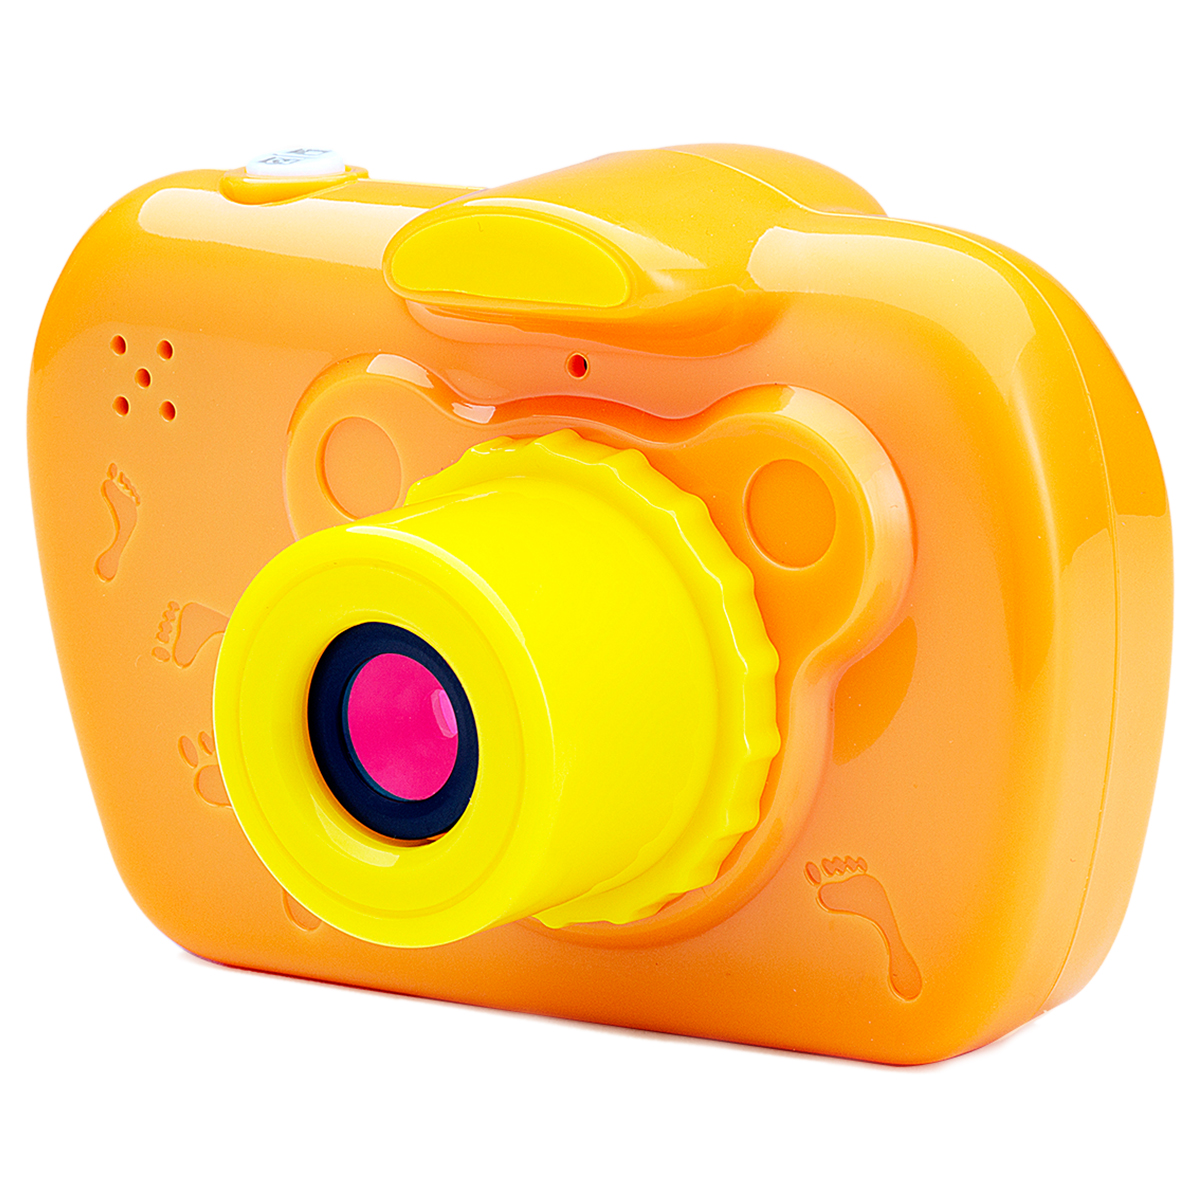 2 Inch 8MP 1080 Pixels Mini LSR Cam Digital Camera For Kids Baby Cute Cartoon Multifunction Toy Camera Children Birthday Best